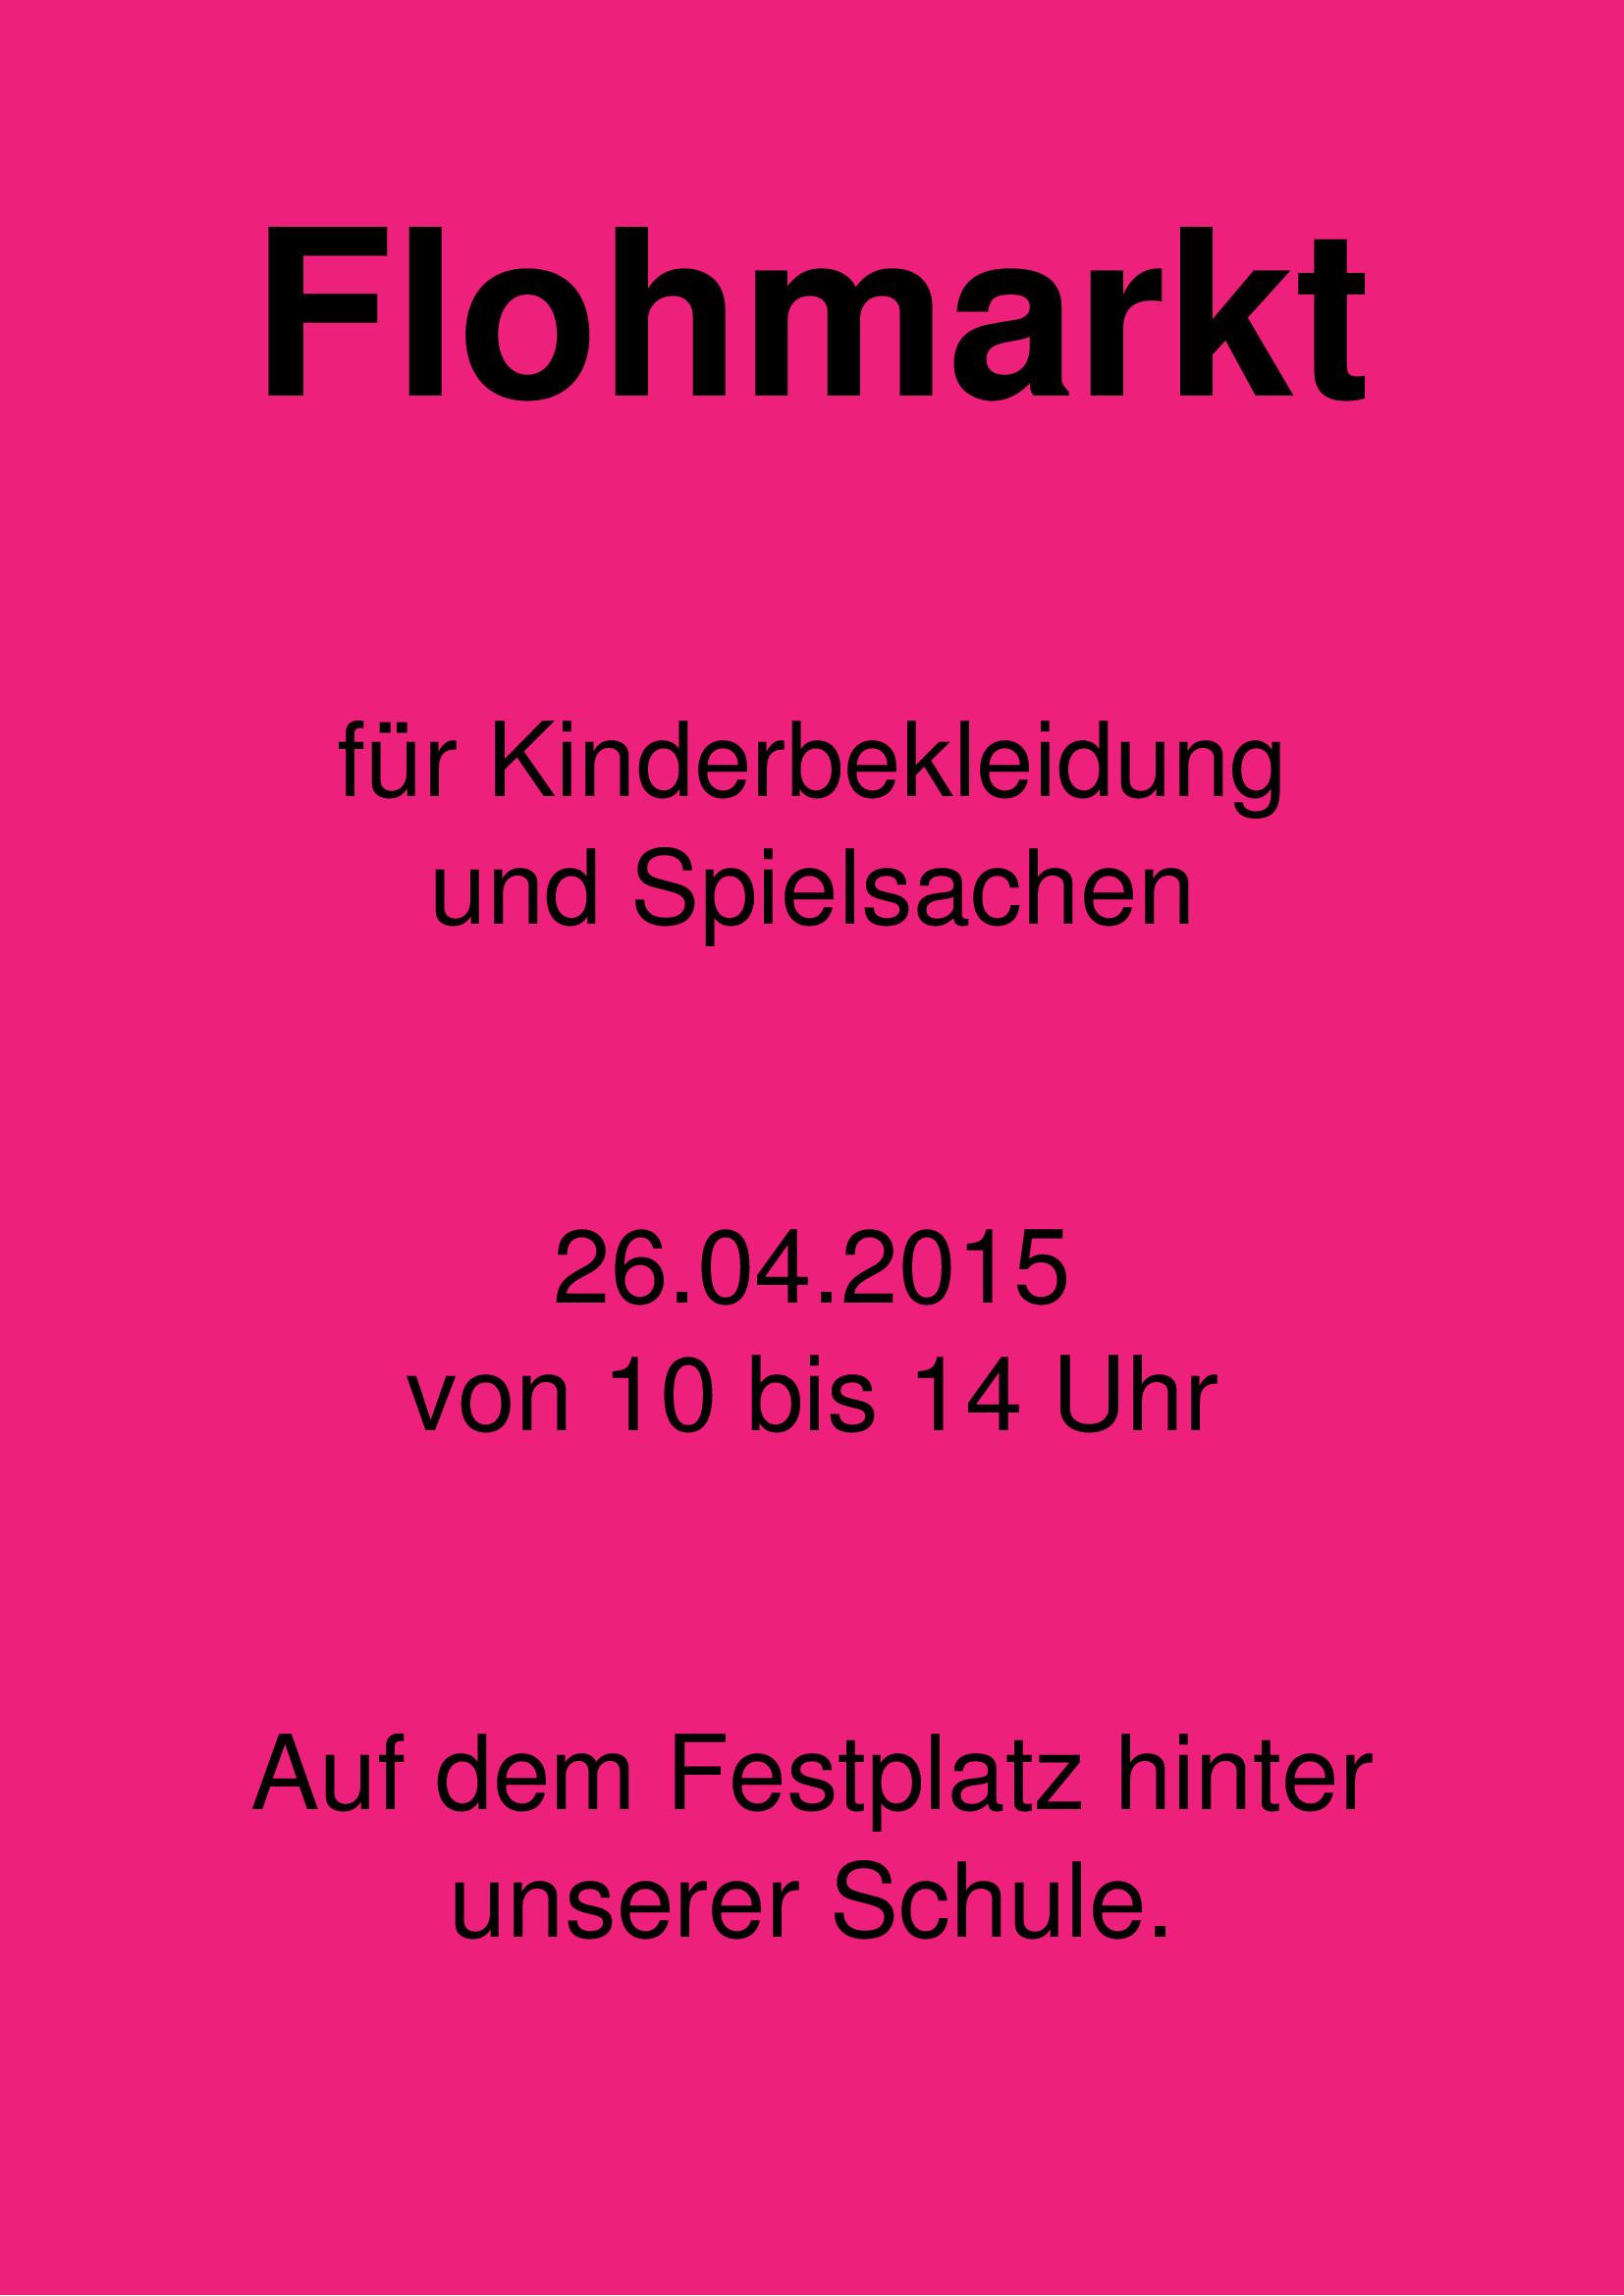 flyer  flohmarkt by chris